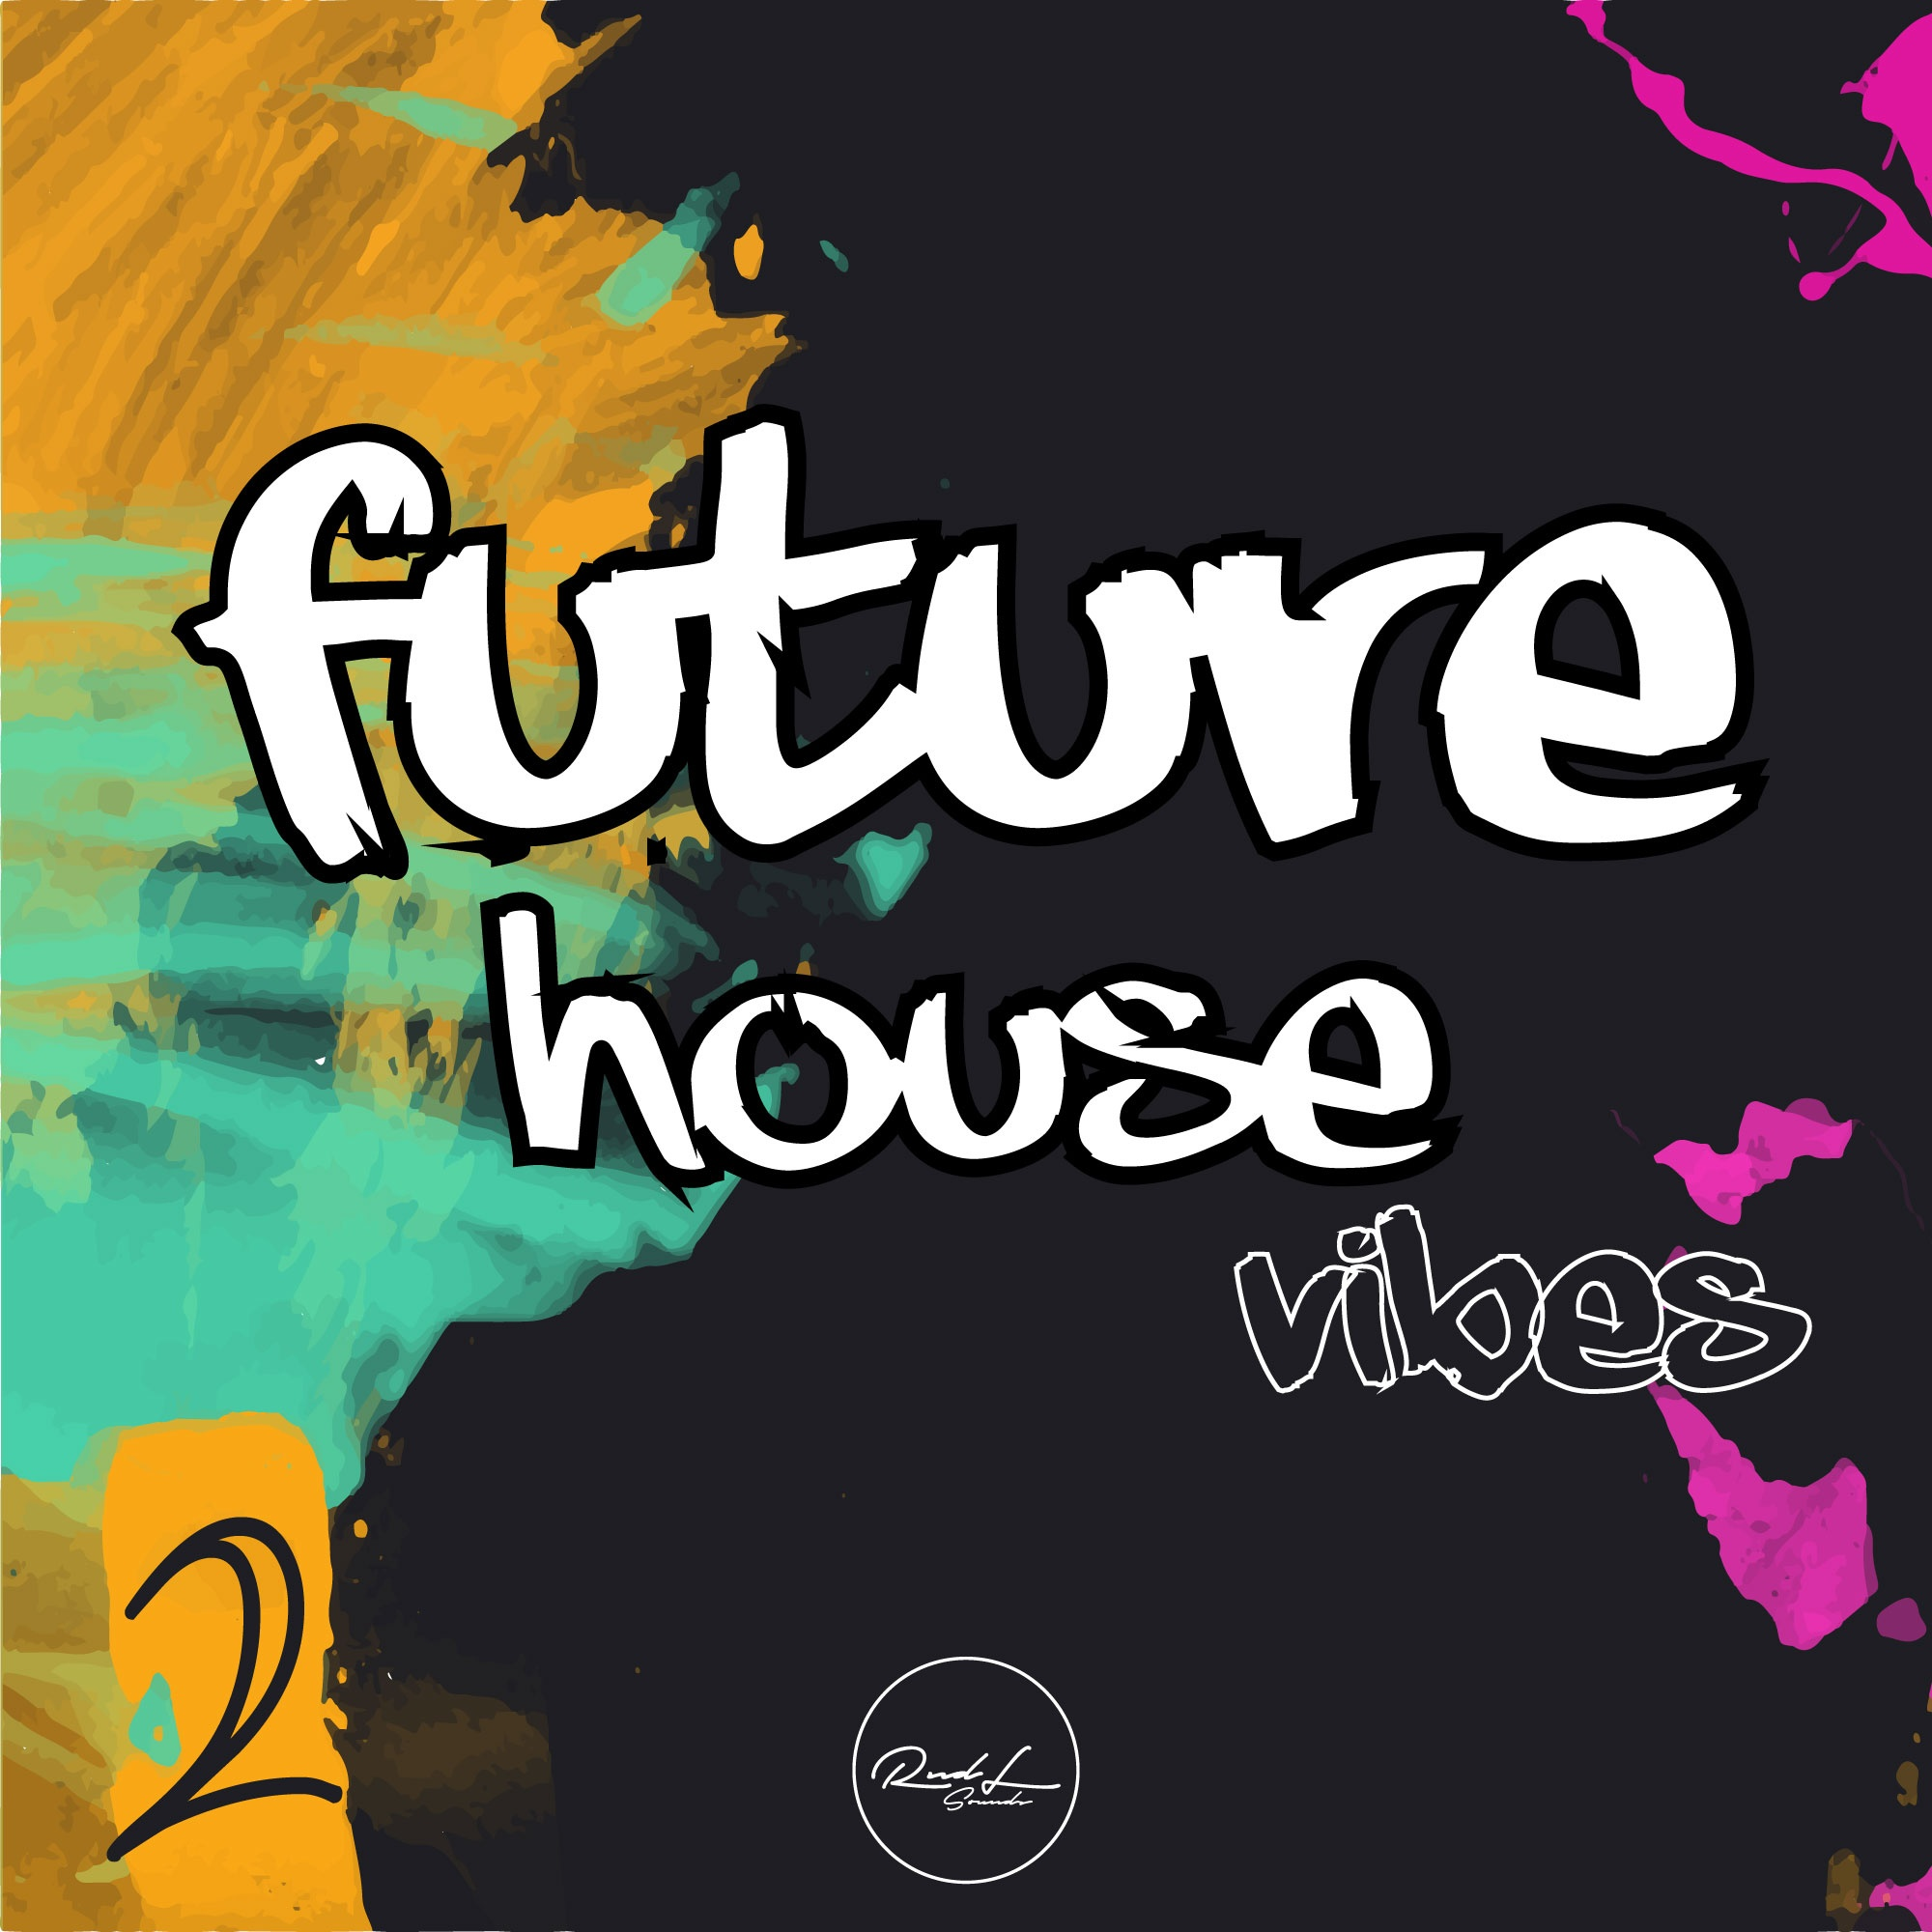 Future House Vibes Vol 2